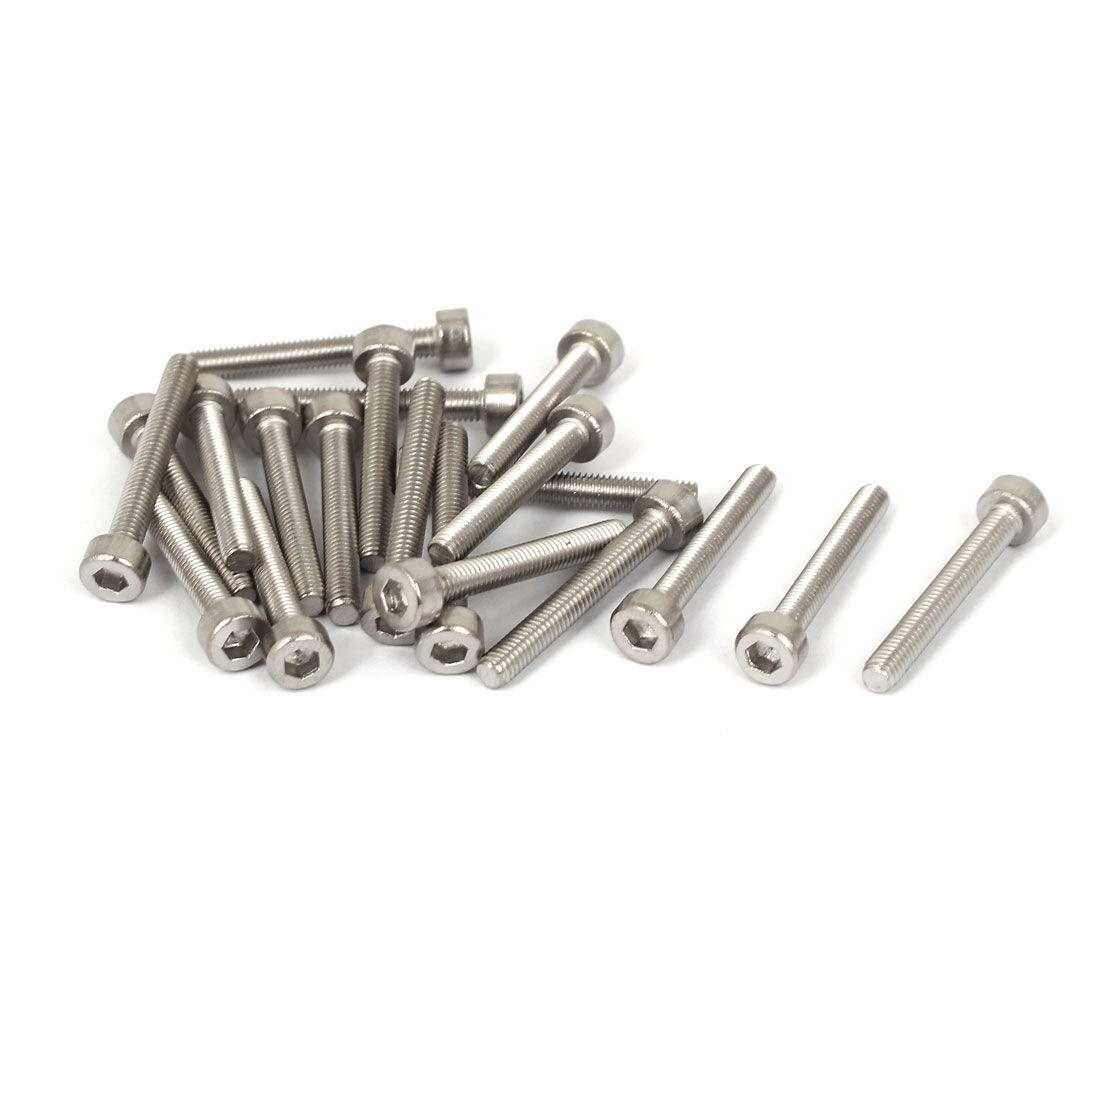 20 Pcs M3x22mm 316 Stainless Steel Metric Hex Socket Head Cap Screws Bolts